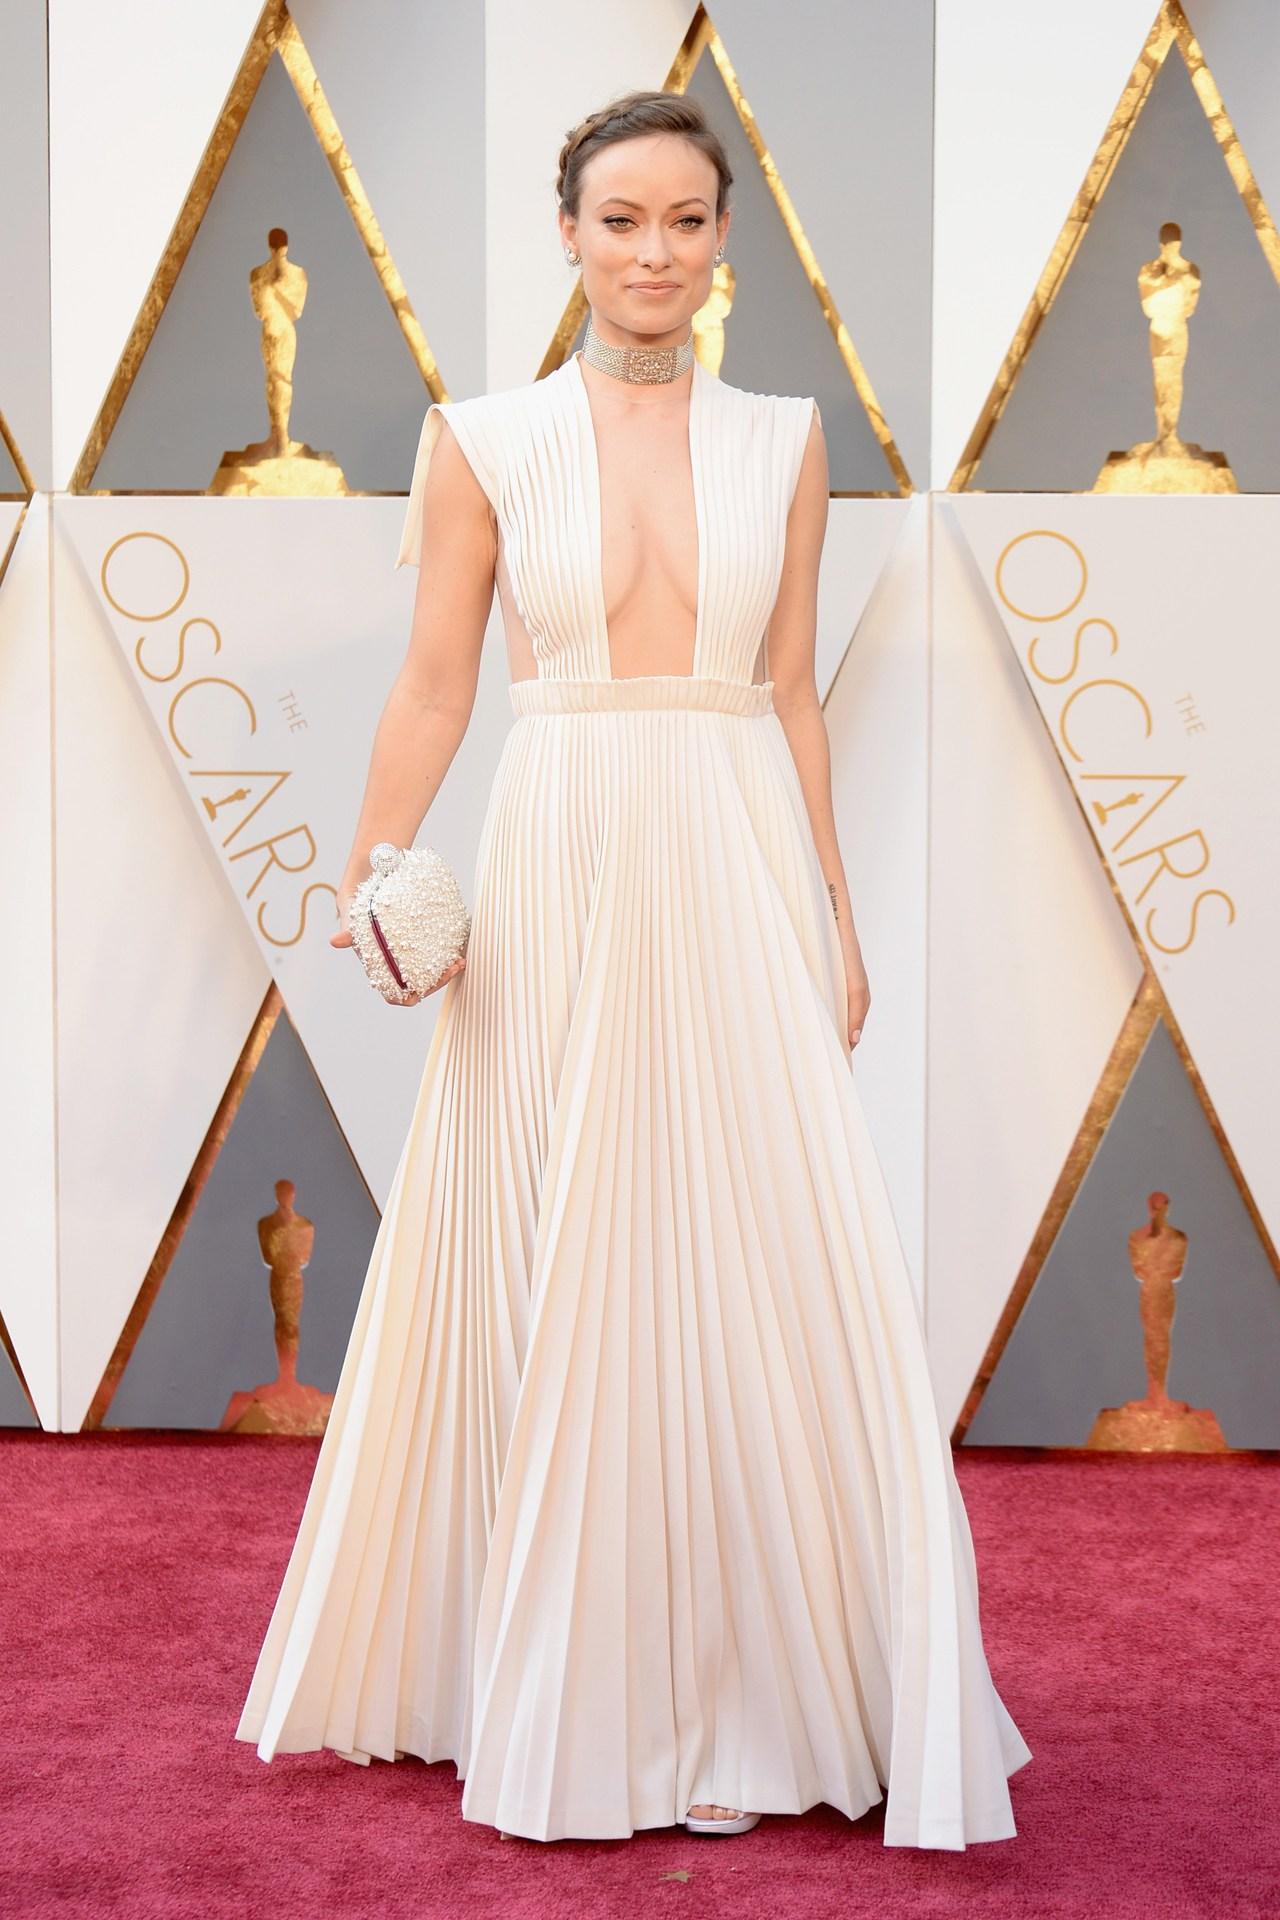 Olivia-Wilde-Oscars-2016-Red-Carpet-Vogue-28Feb16-Getty_b.jpg